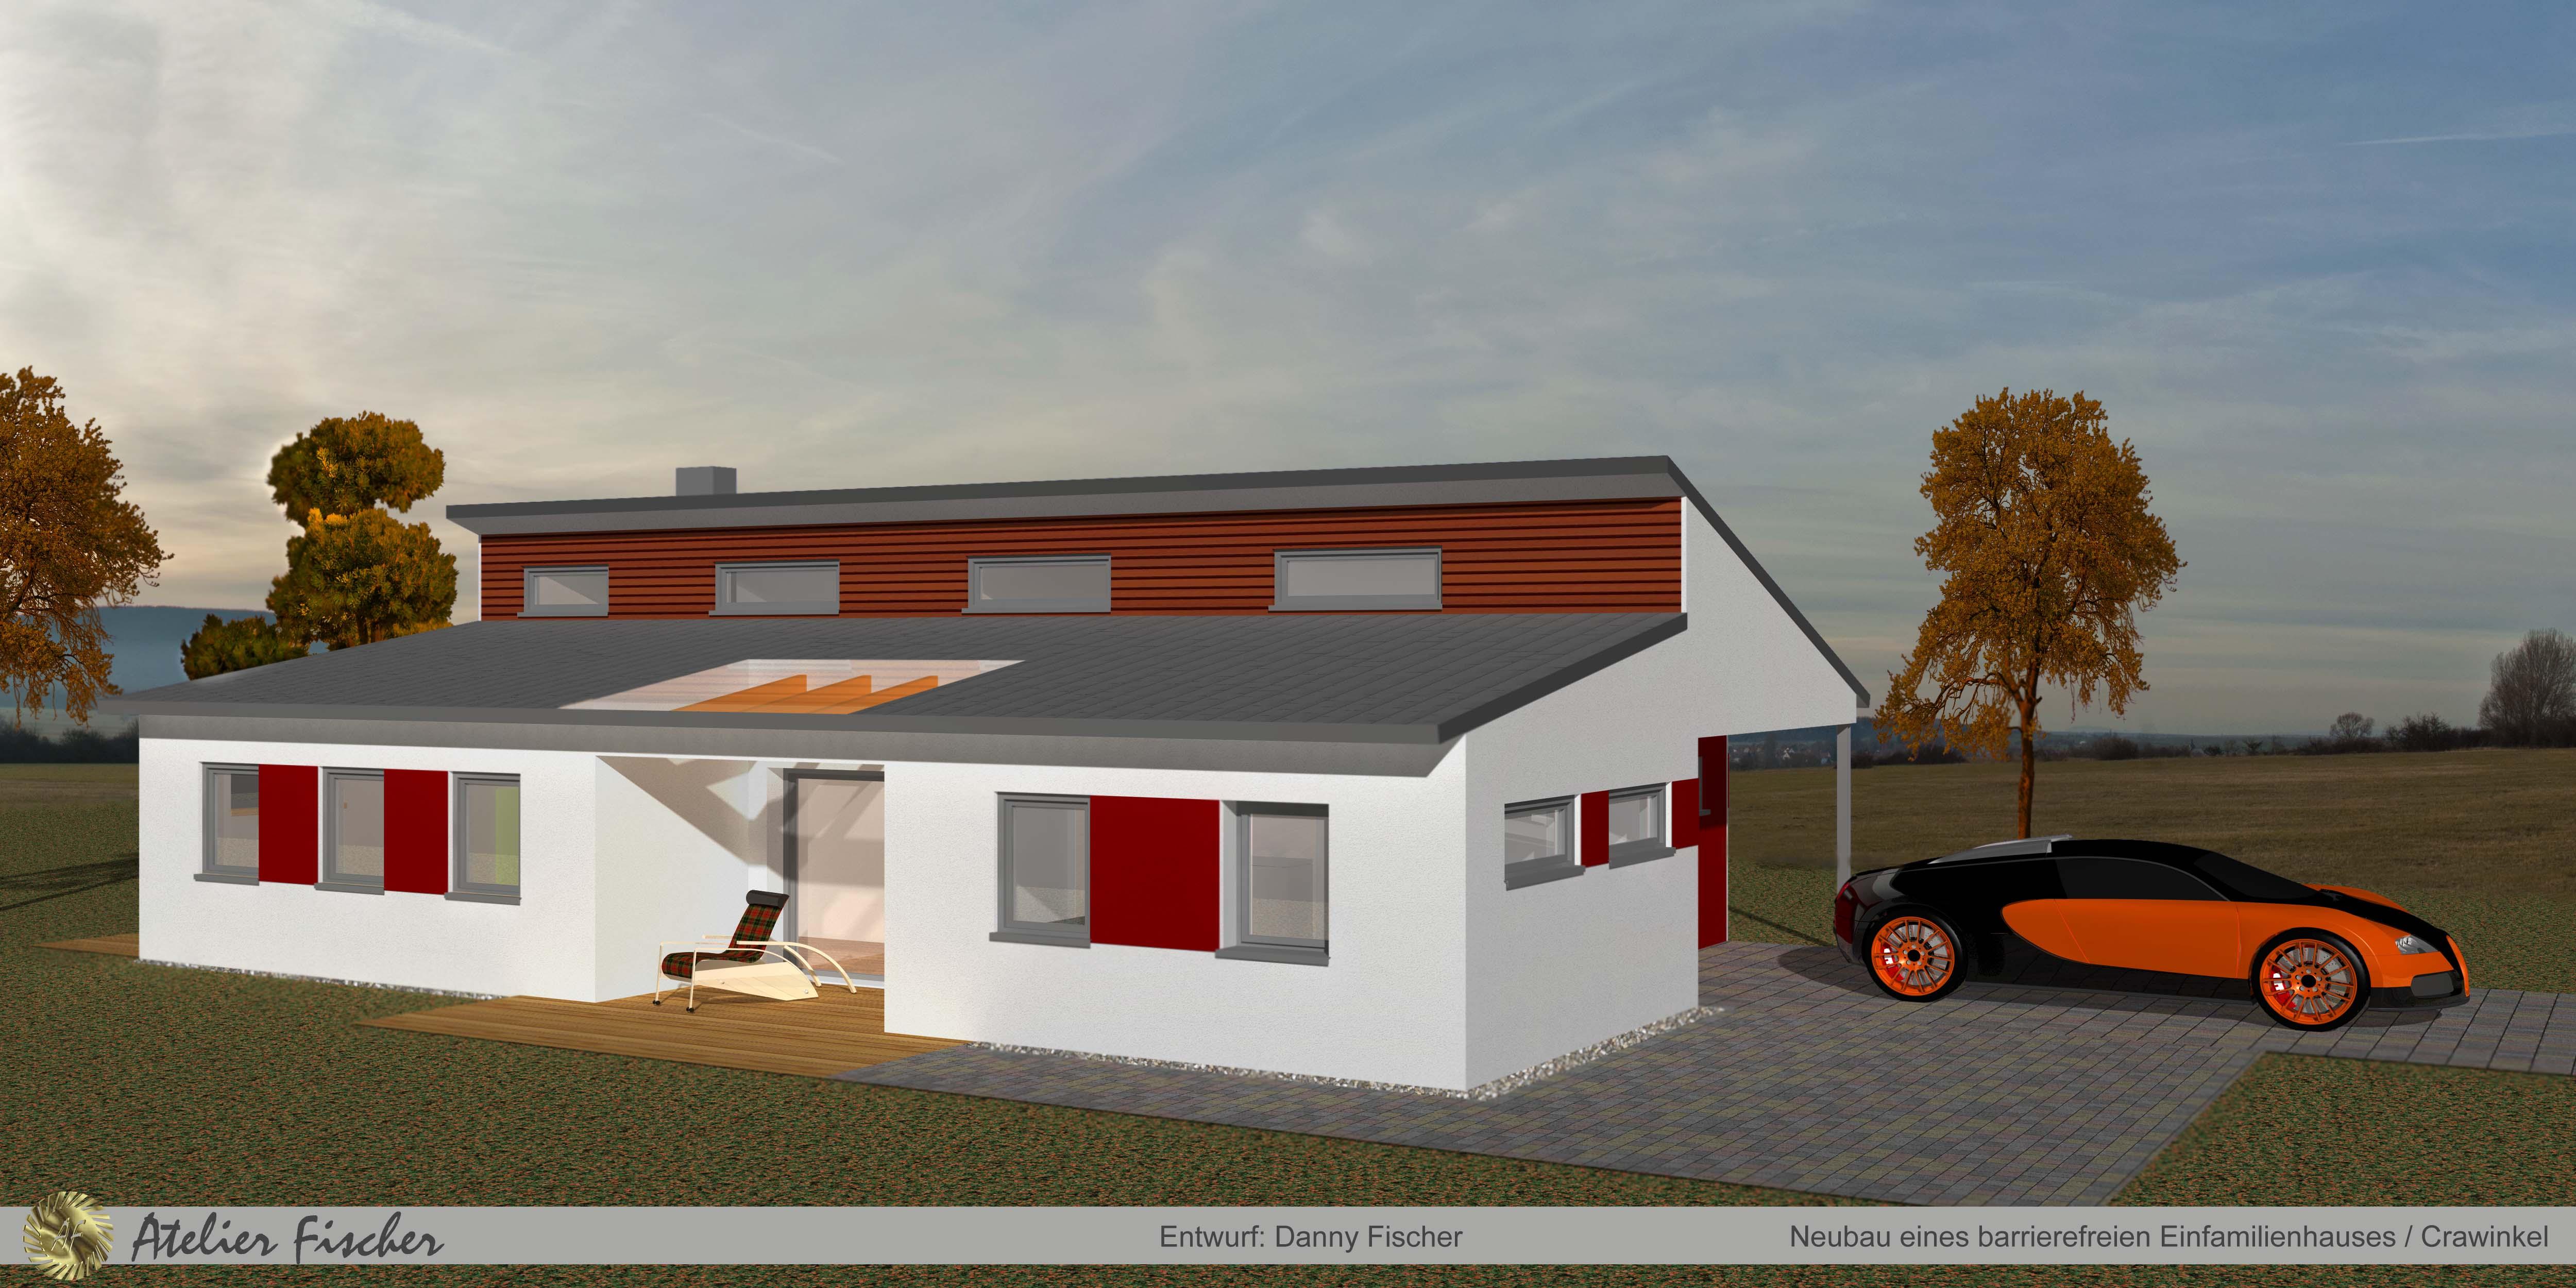 Barrierefreies Einfamilienhaus / Crawinkel